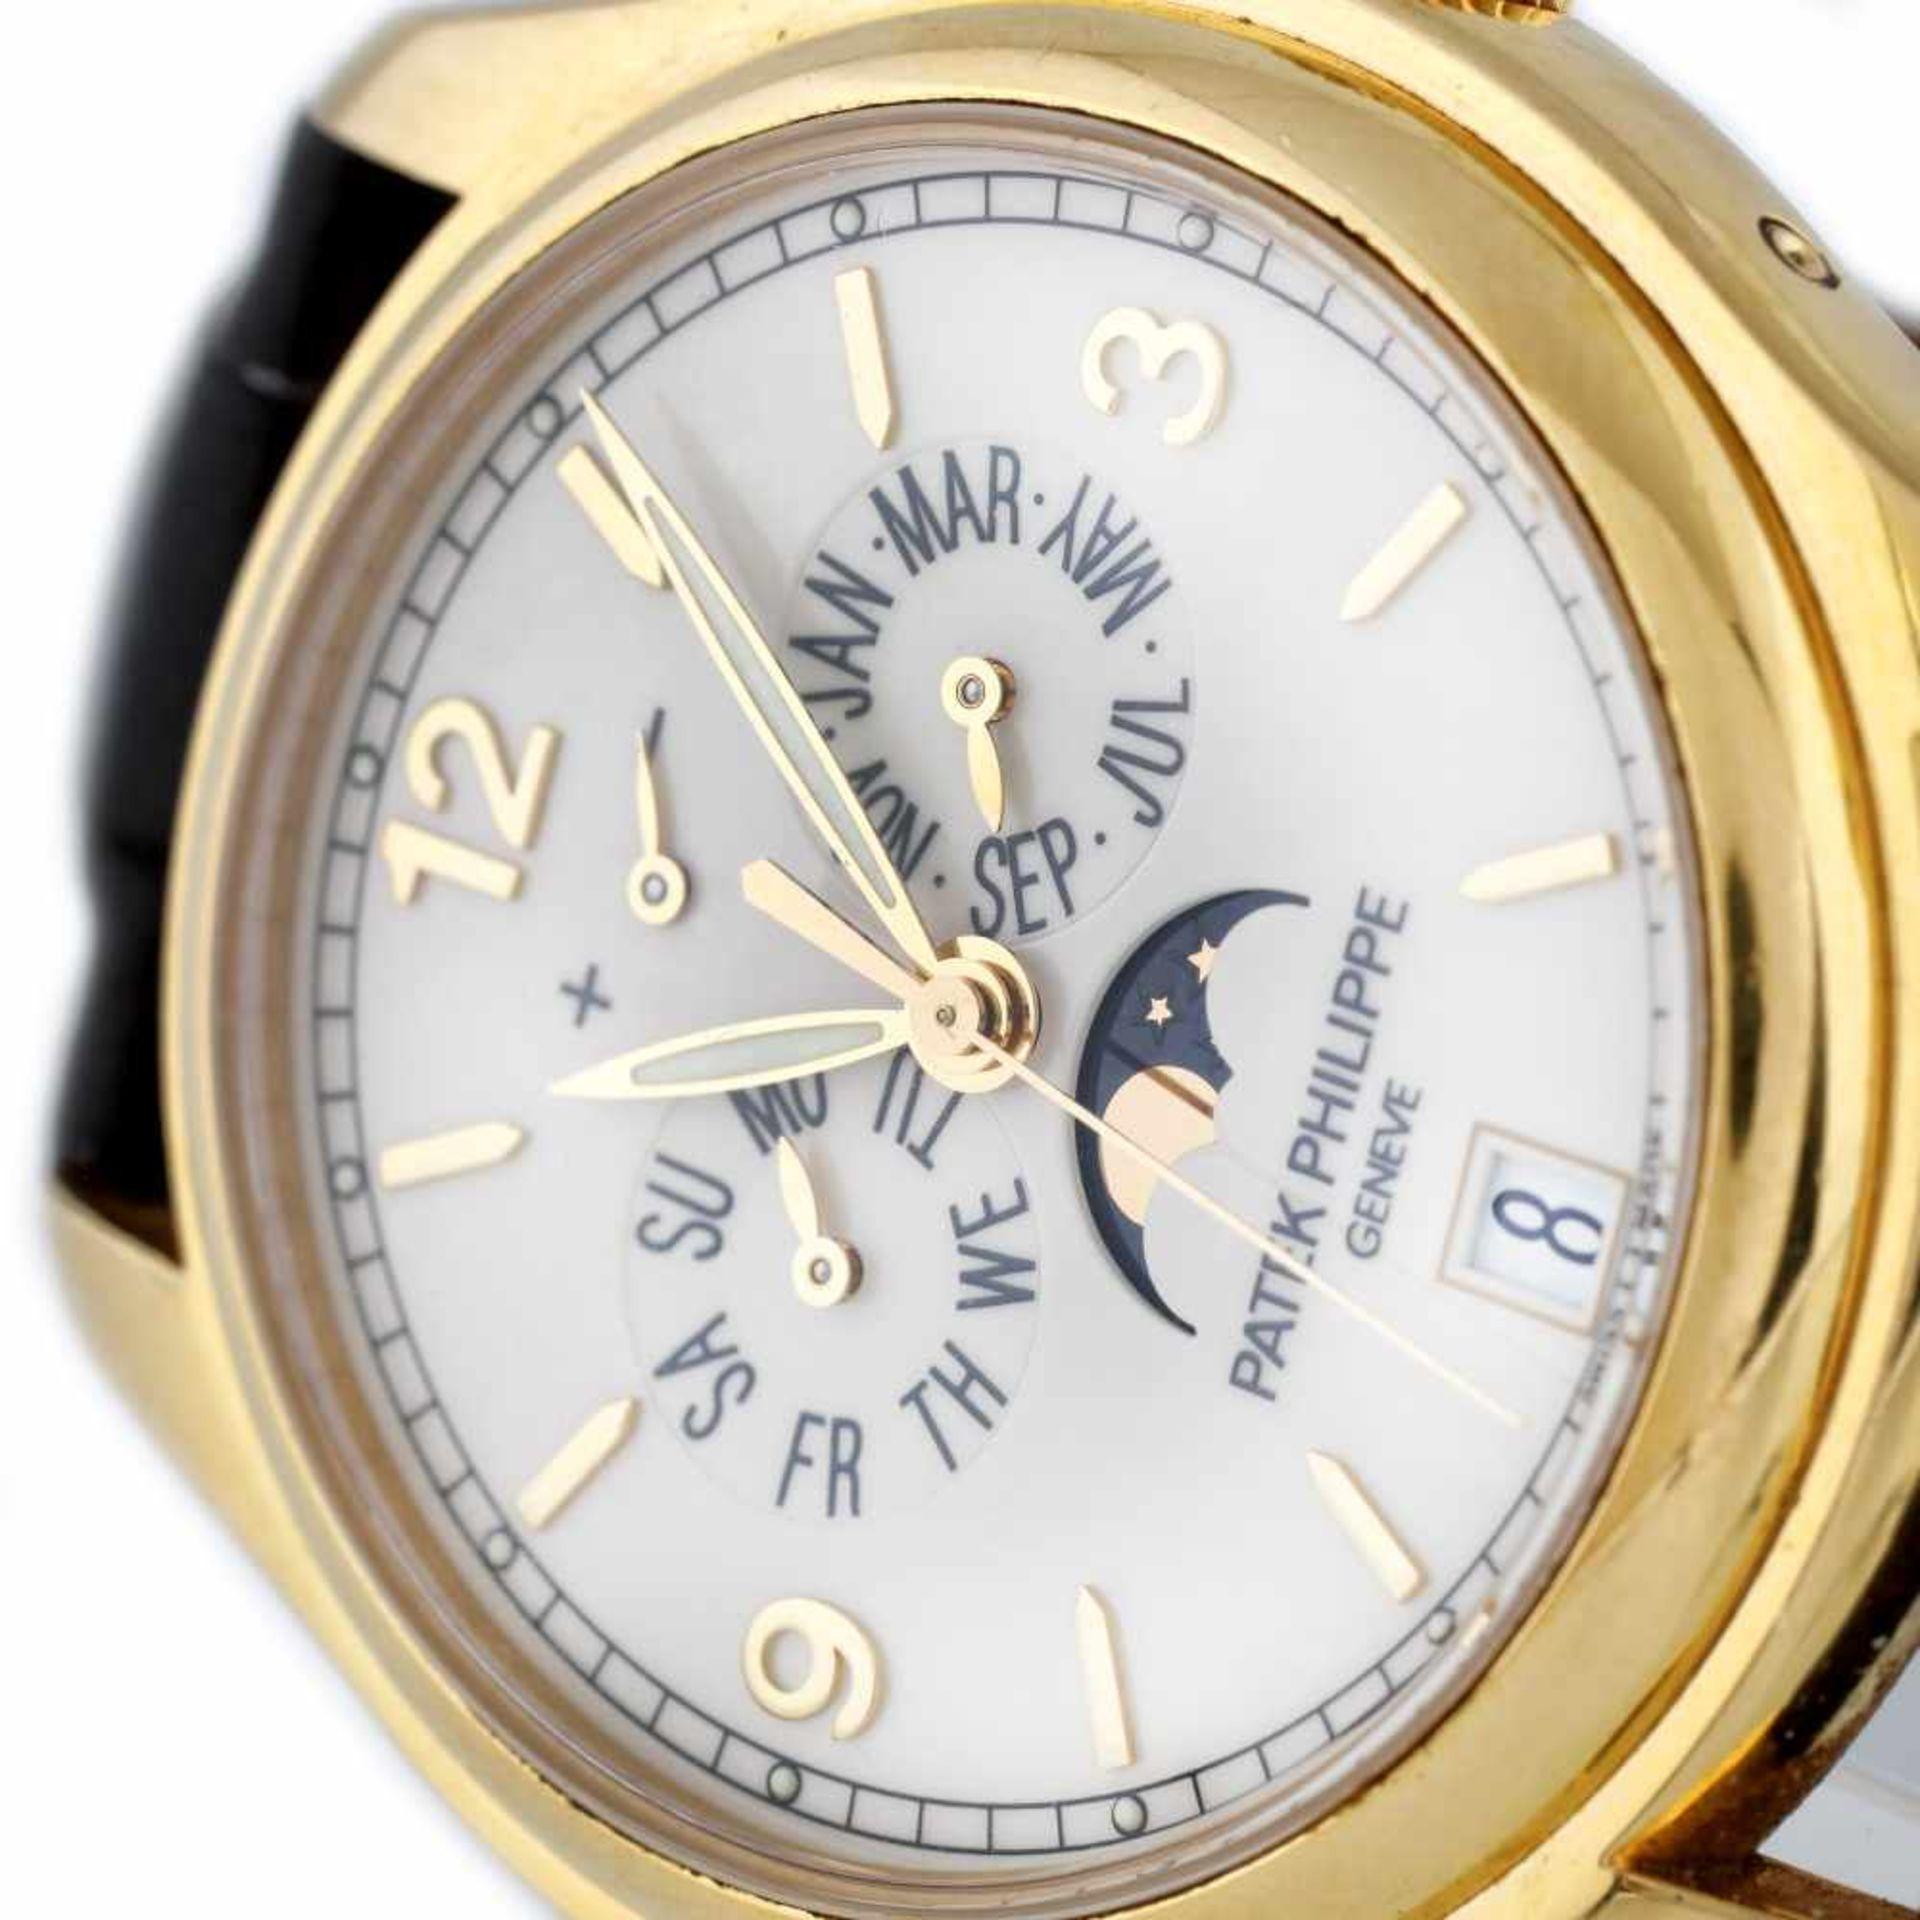 Patek Philippe Annual Calendar Moon Phase wristwatch, gold, men, provenance documents and original b - Bild 2 aus 4